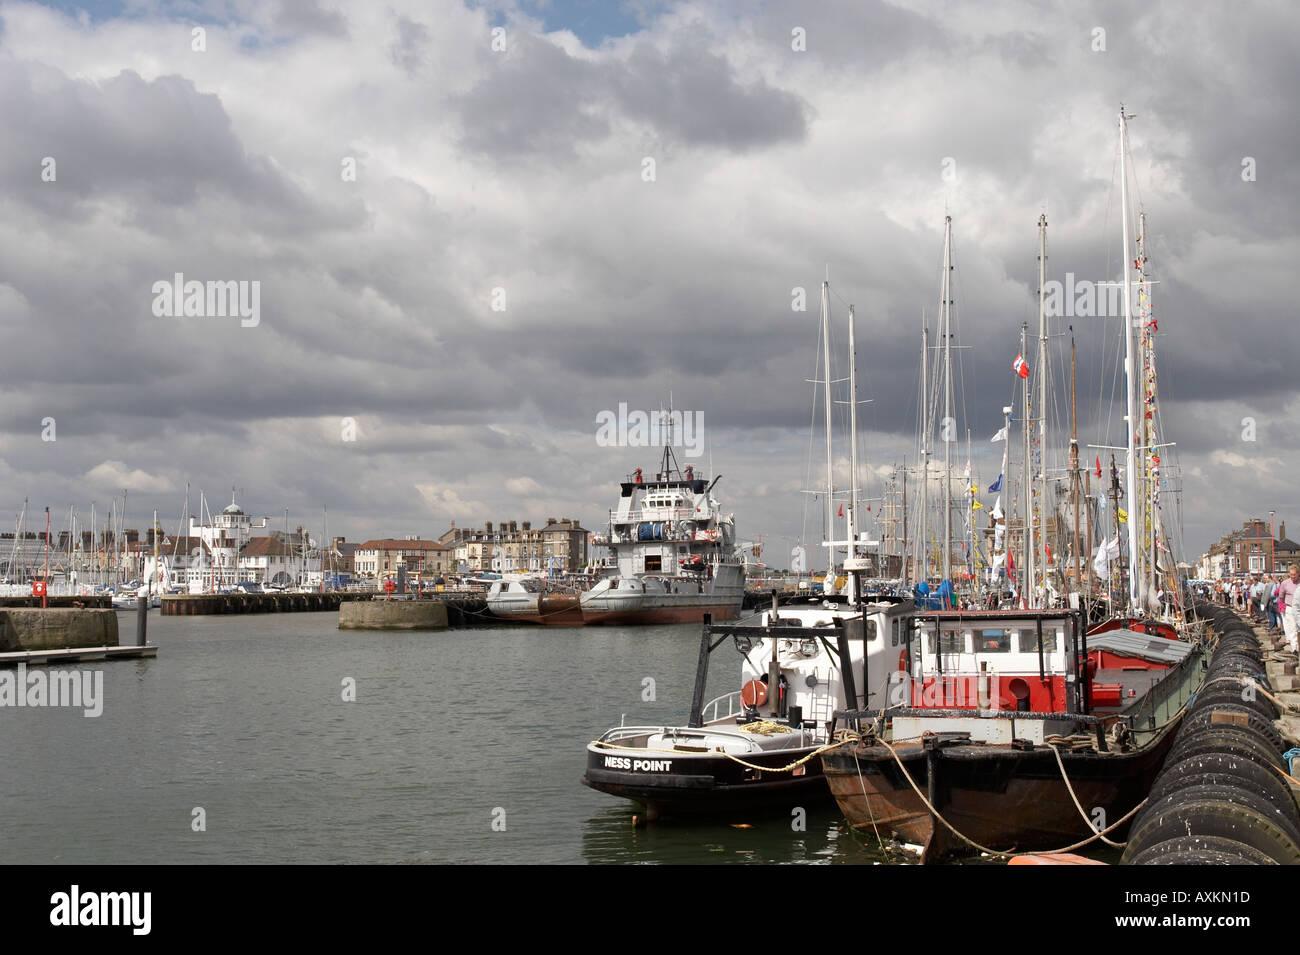 Lowestoft Harbour - Stock Image